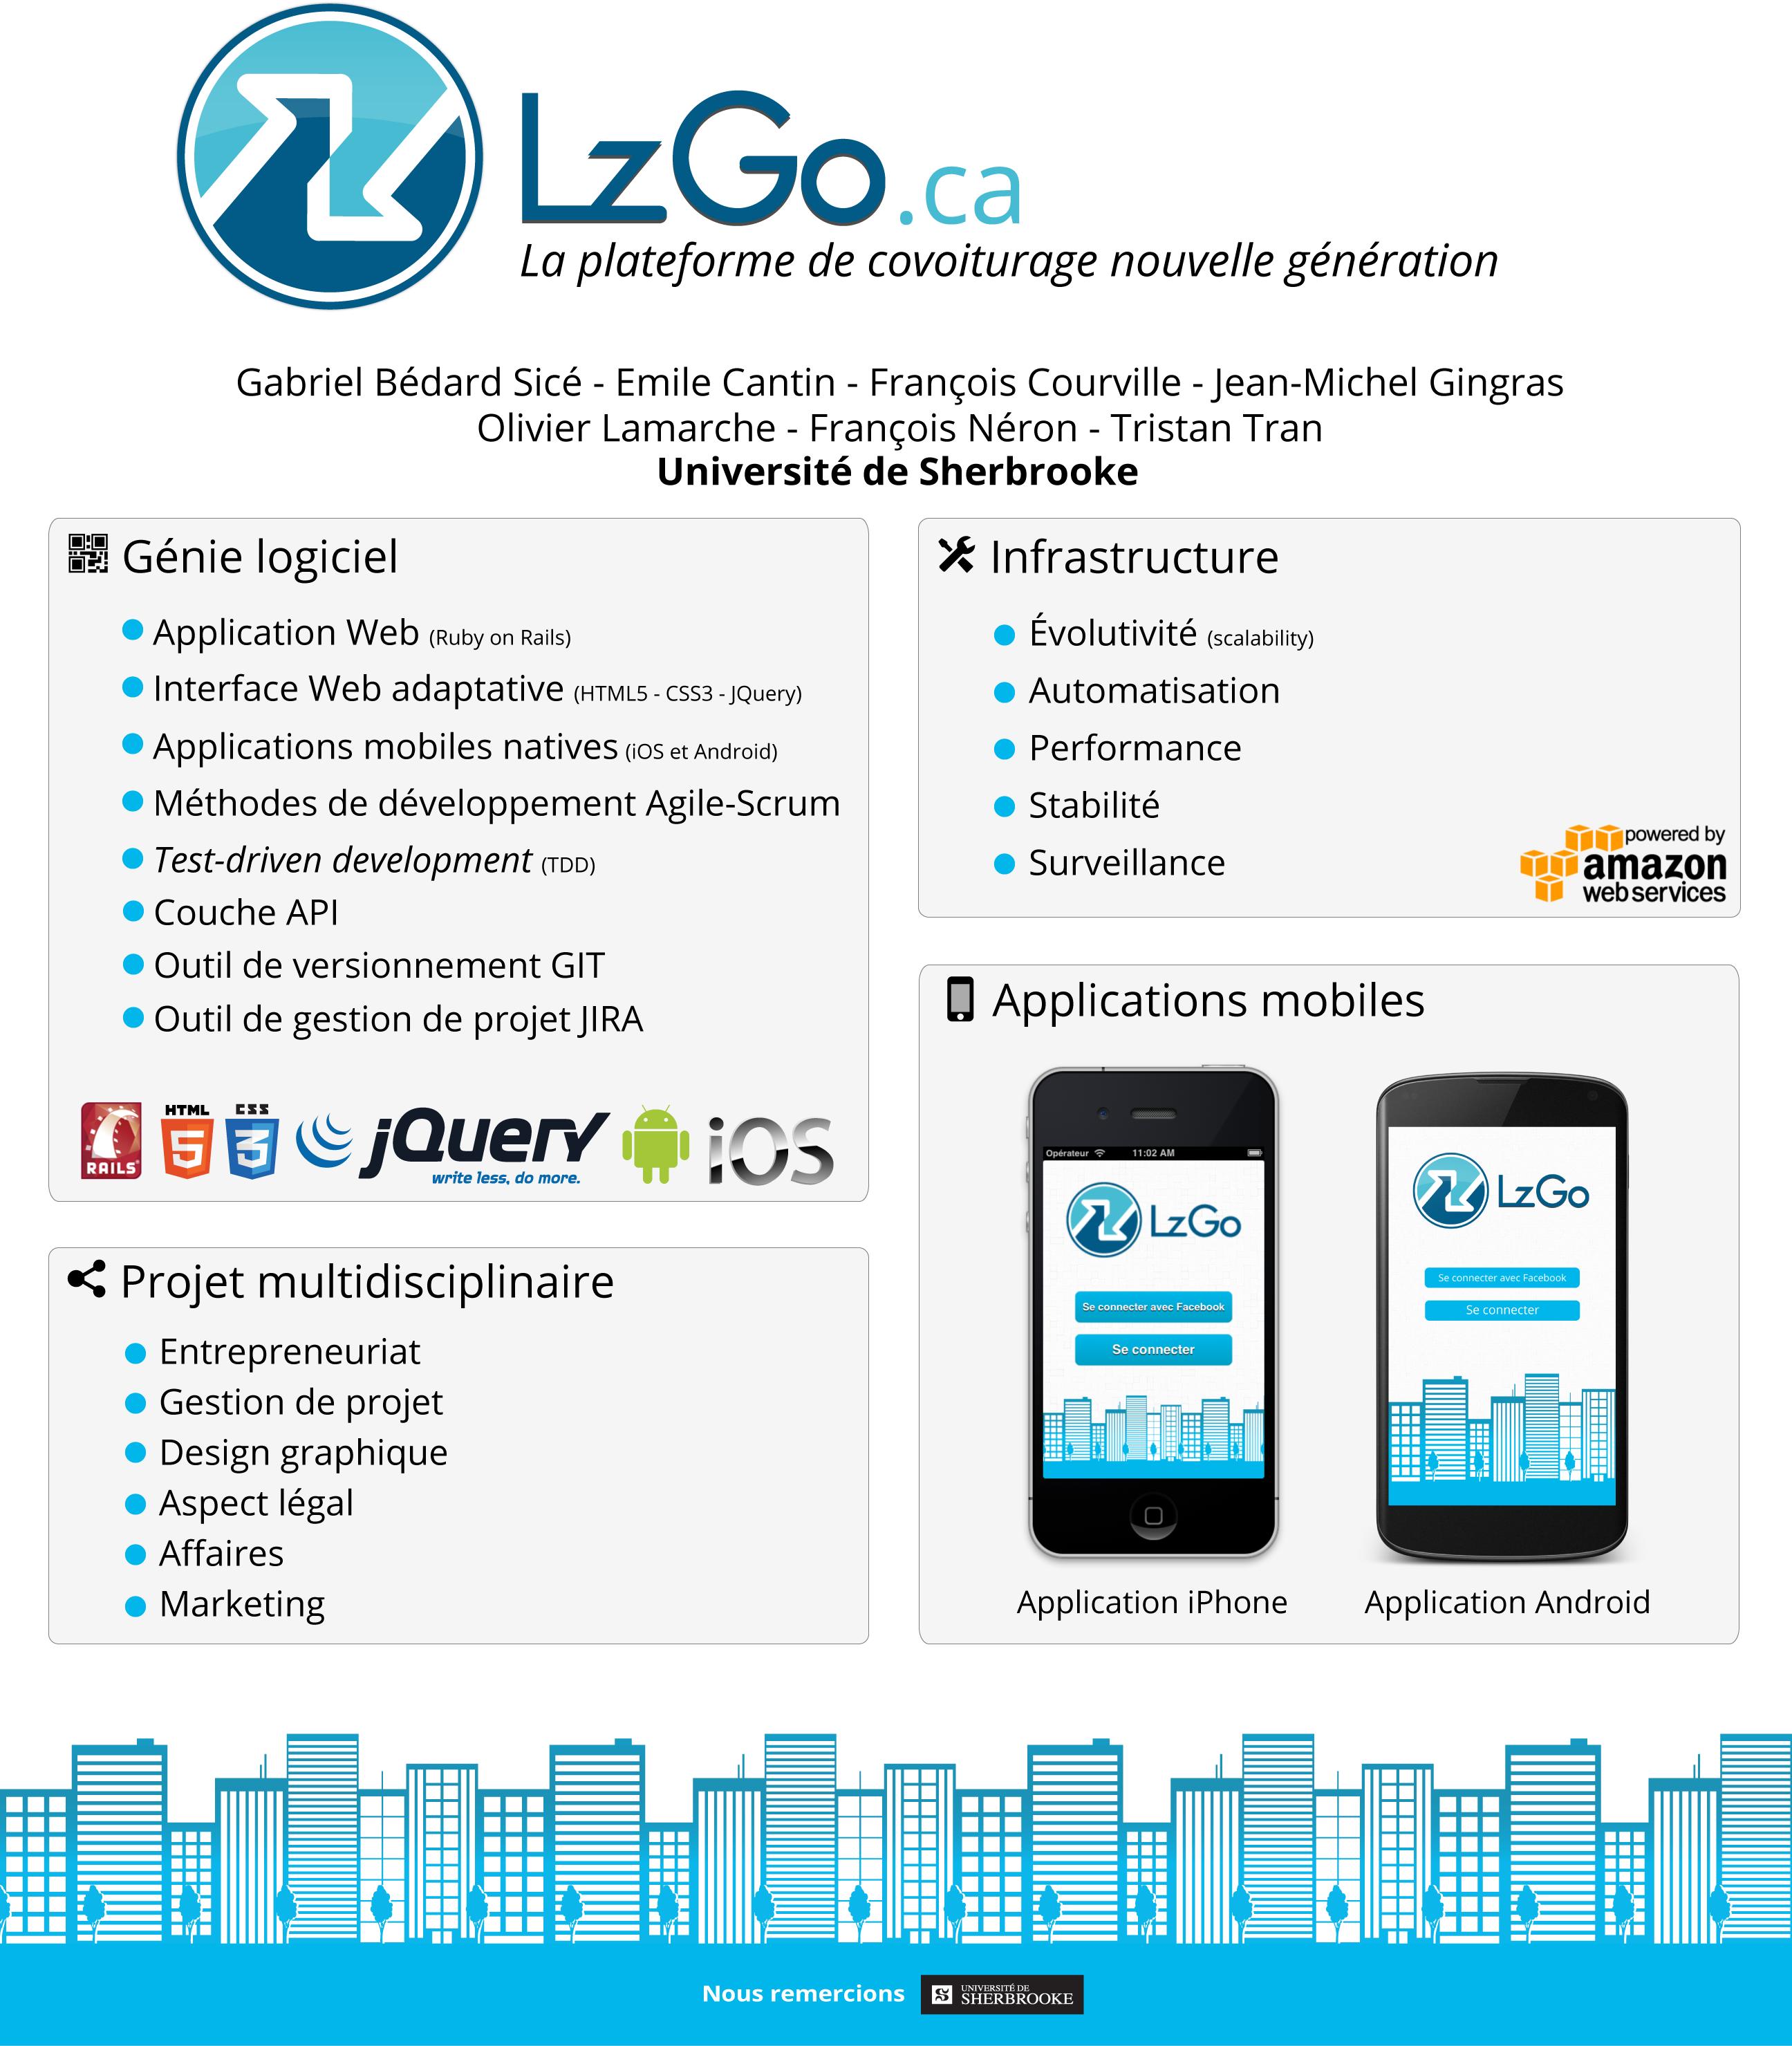 LzGo.ca - The next generation ride sharing platform